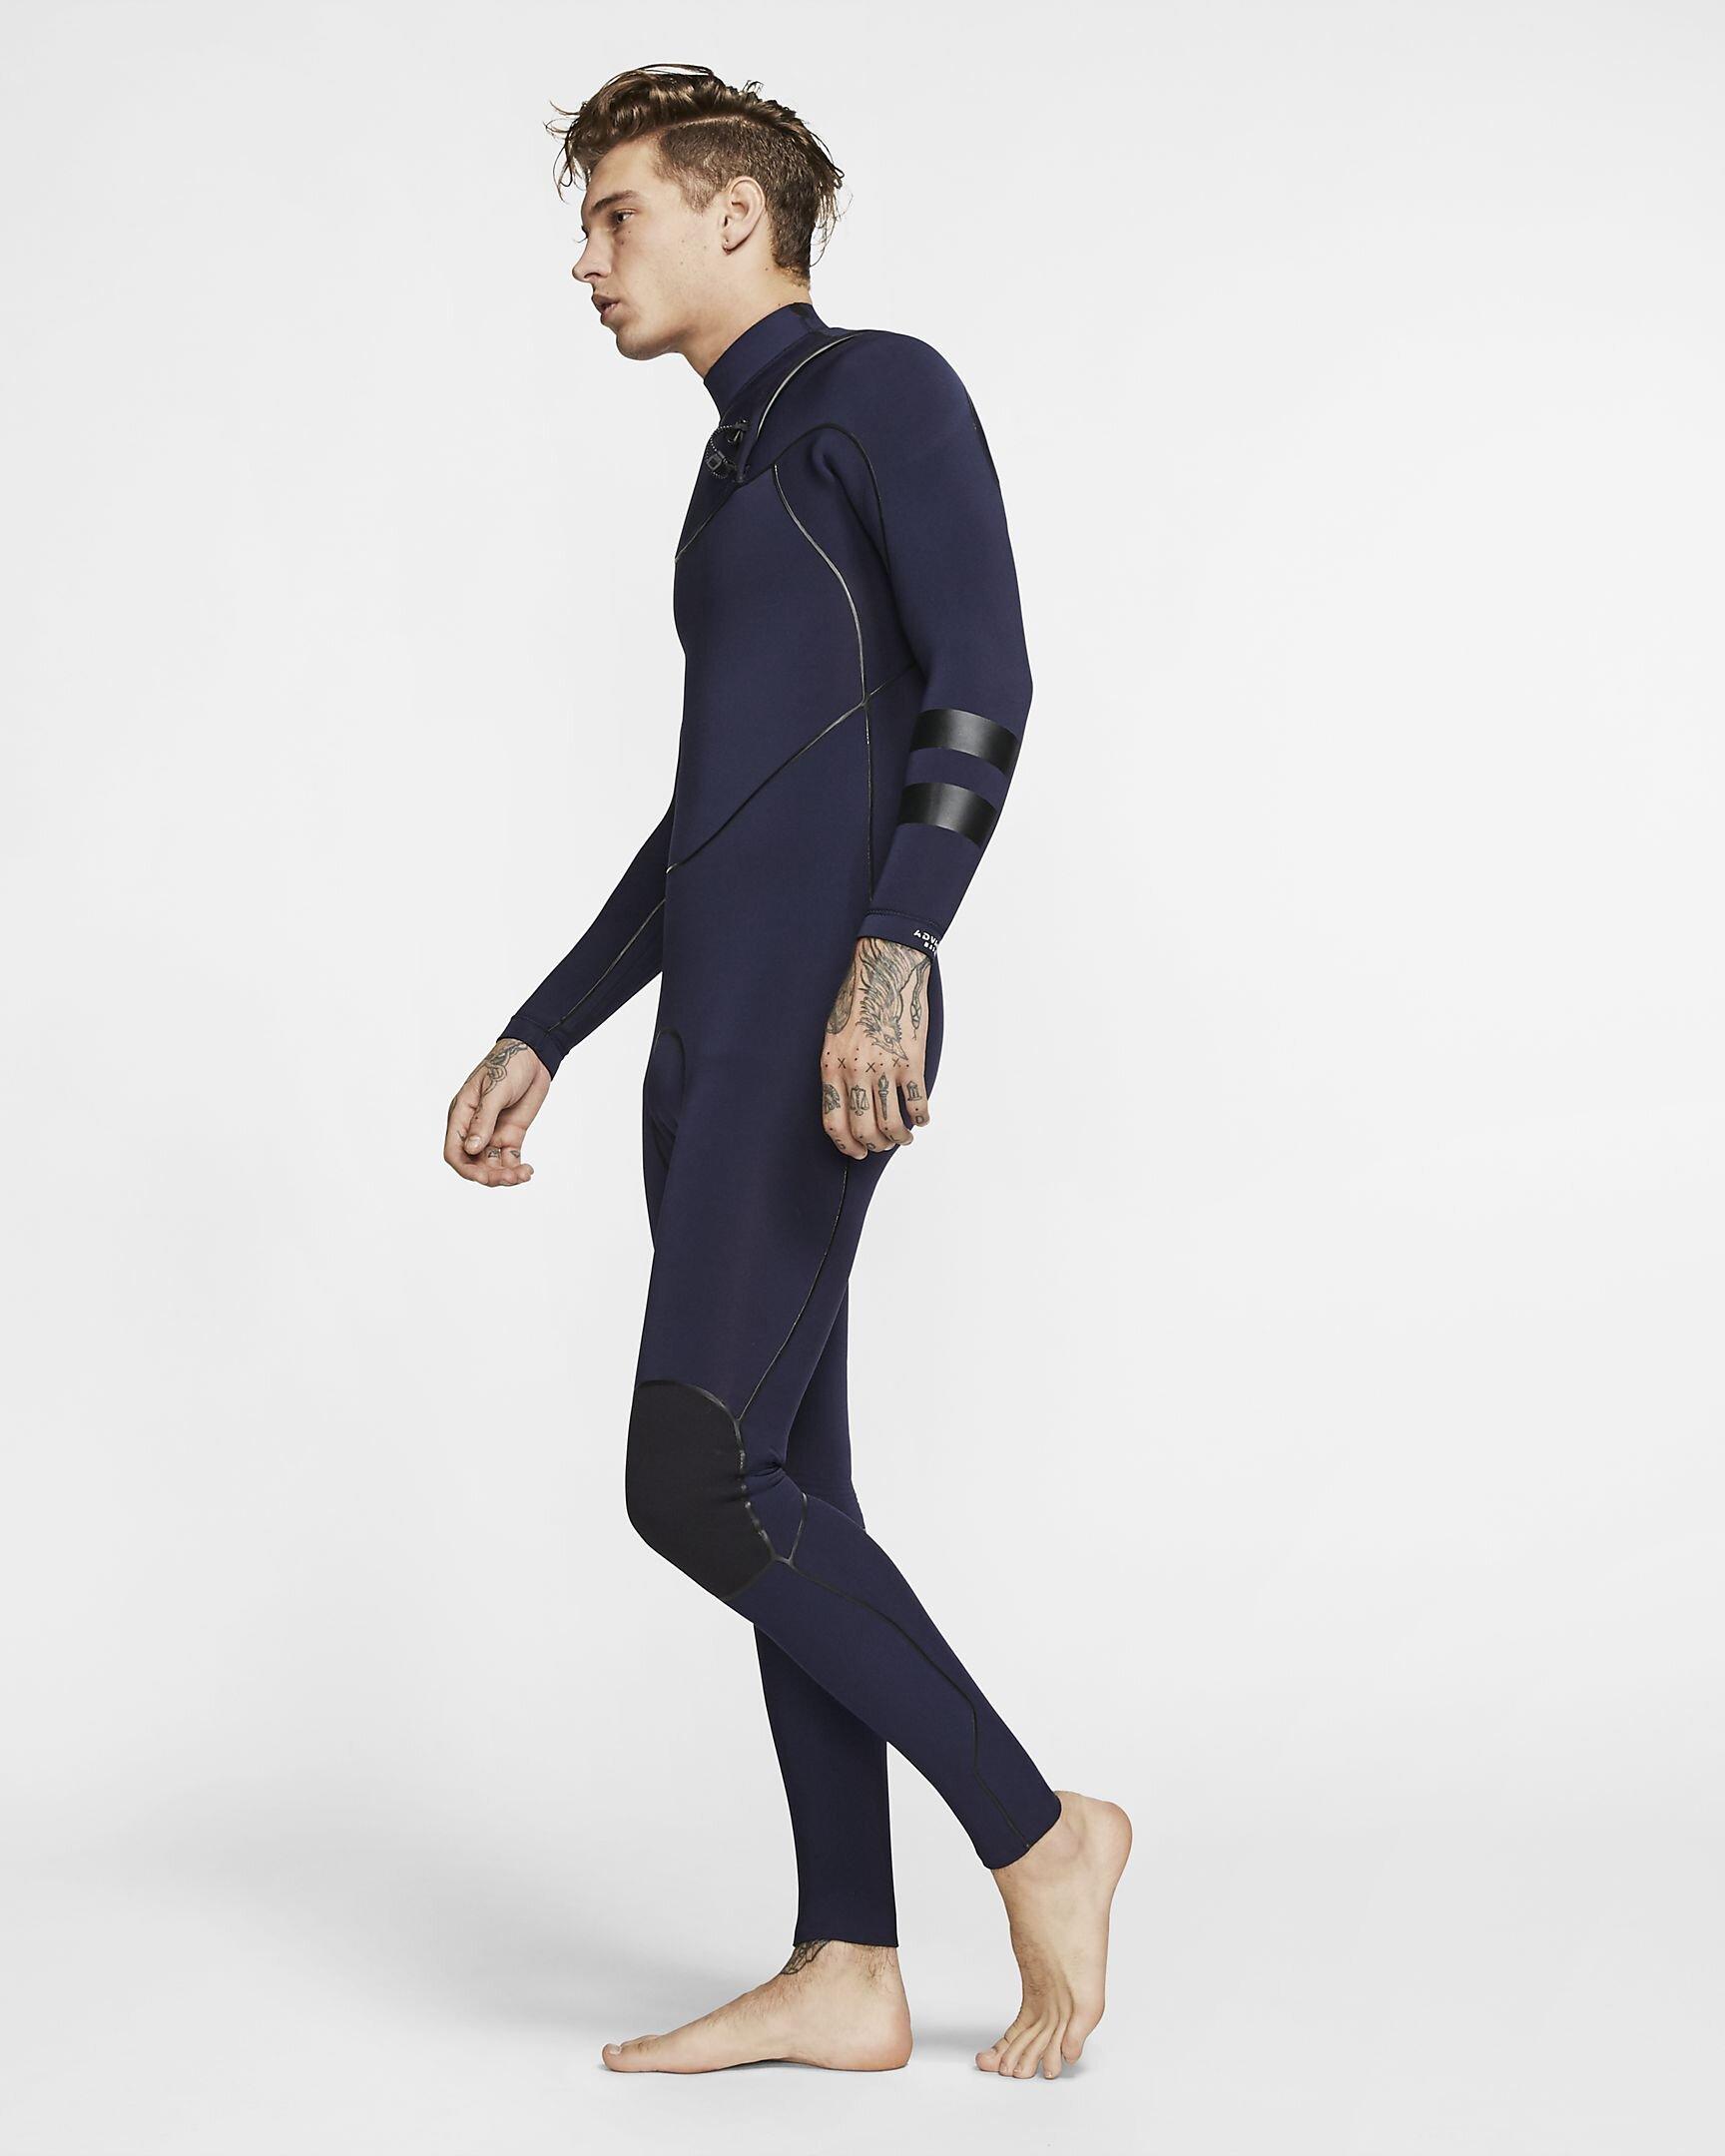 hurley-advantage-max-4-3-fullsuit-mens-wetsuit-8ZN8gg-1.jpg